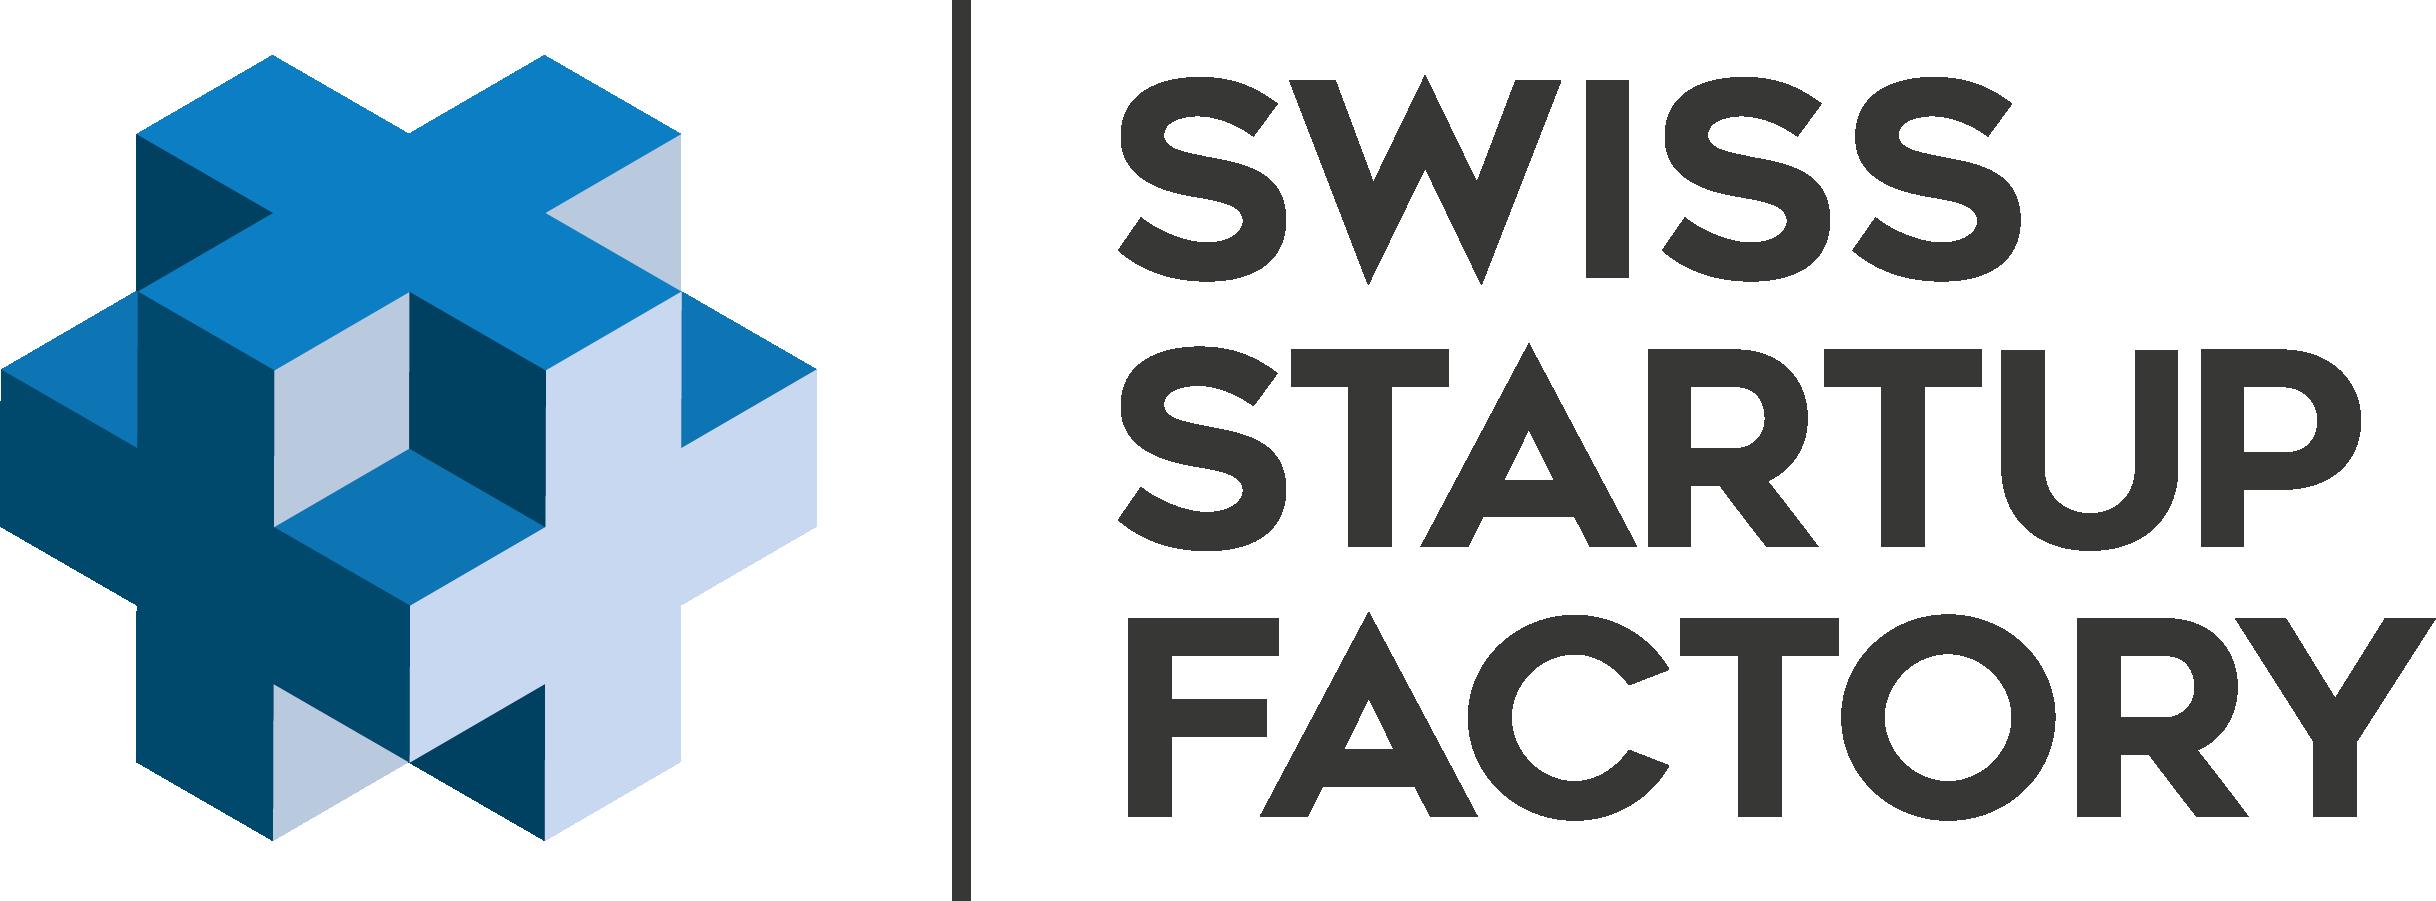 Swiss Startup Factory